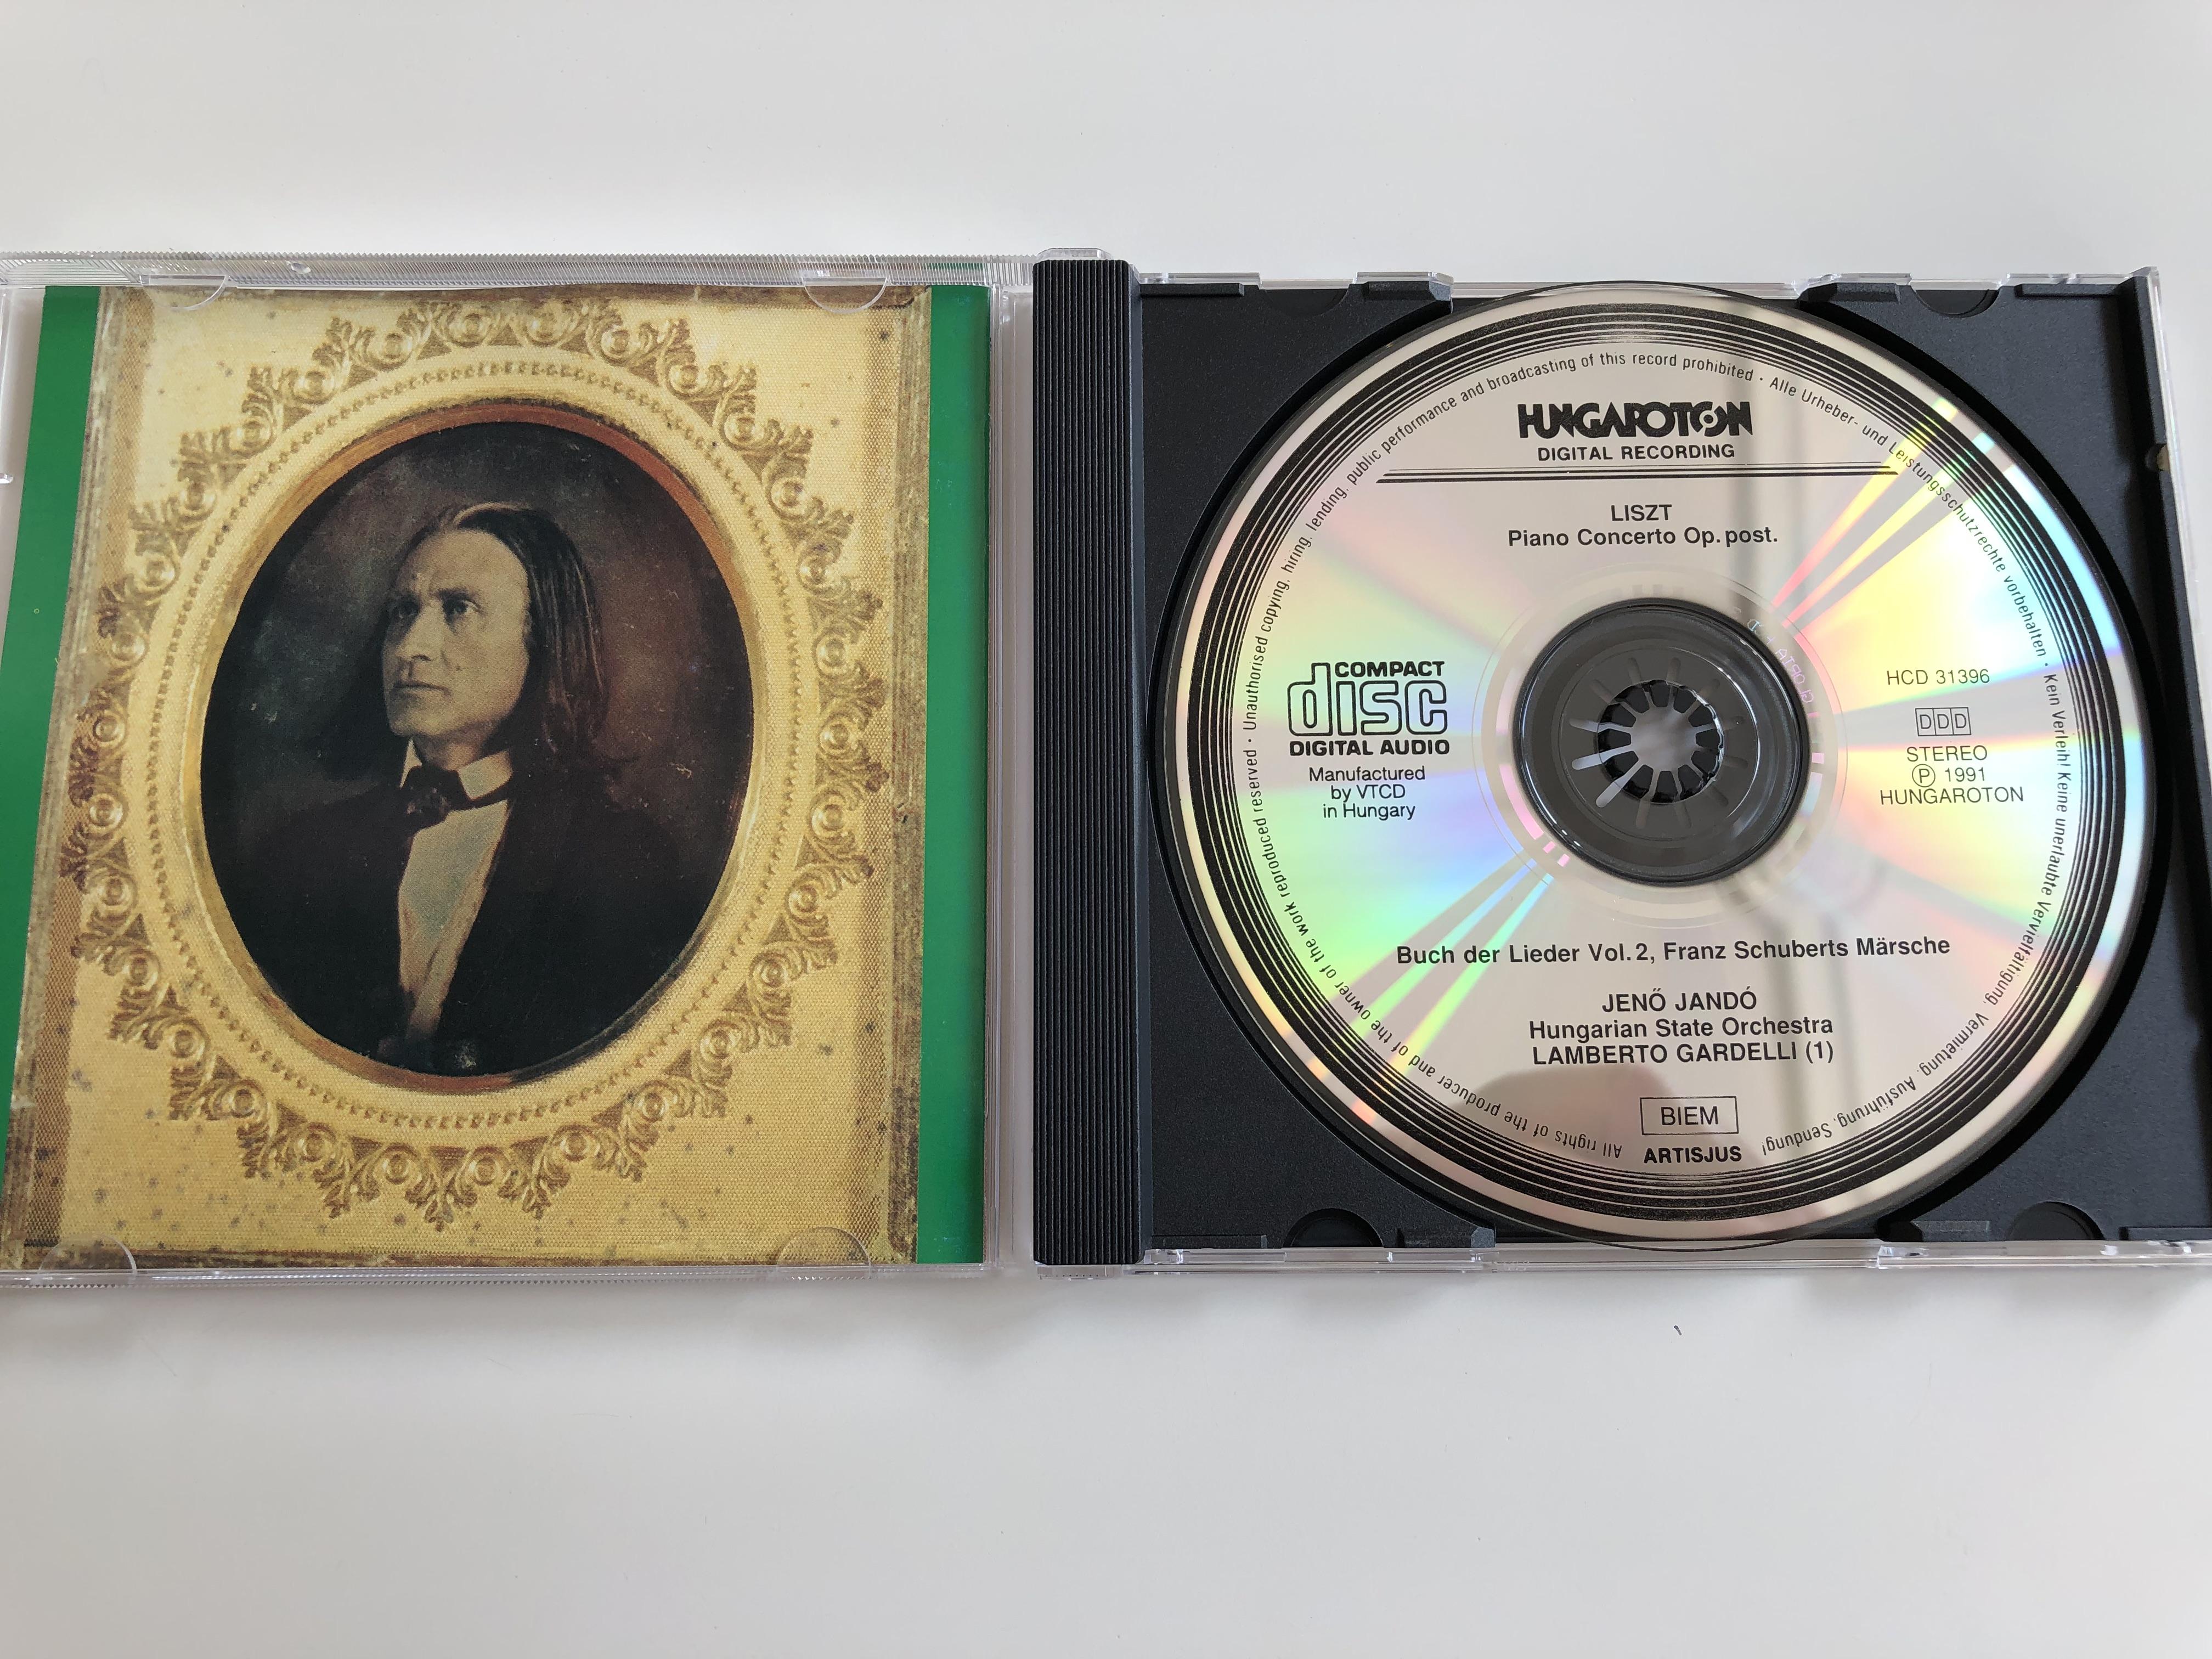 liszt-ferenc-piano-concerto-opus-postumum-buch-der-lieder-vol-2.-3-marches-by-schubert-hungarian-state-orchestra-5-.jpg